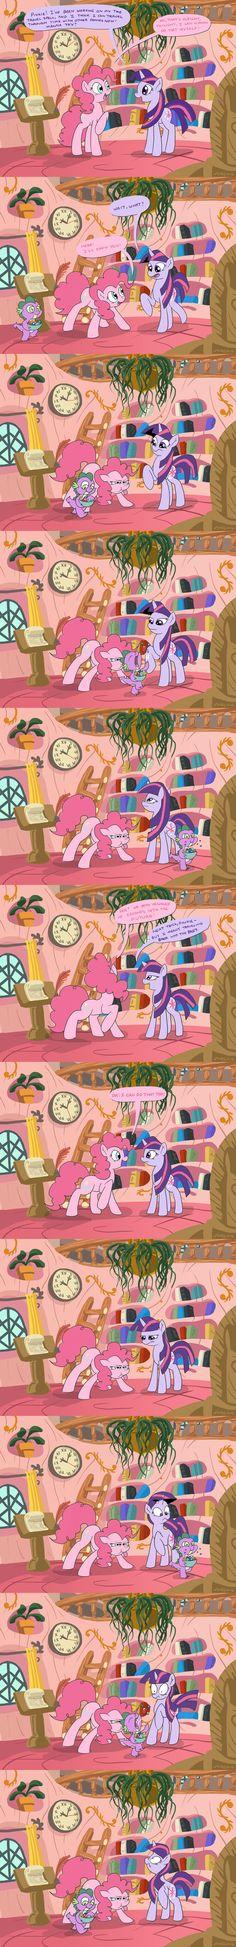 Time Travelin' Pinkie Pie by *DocWario on deviantART